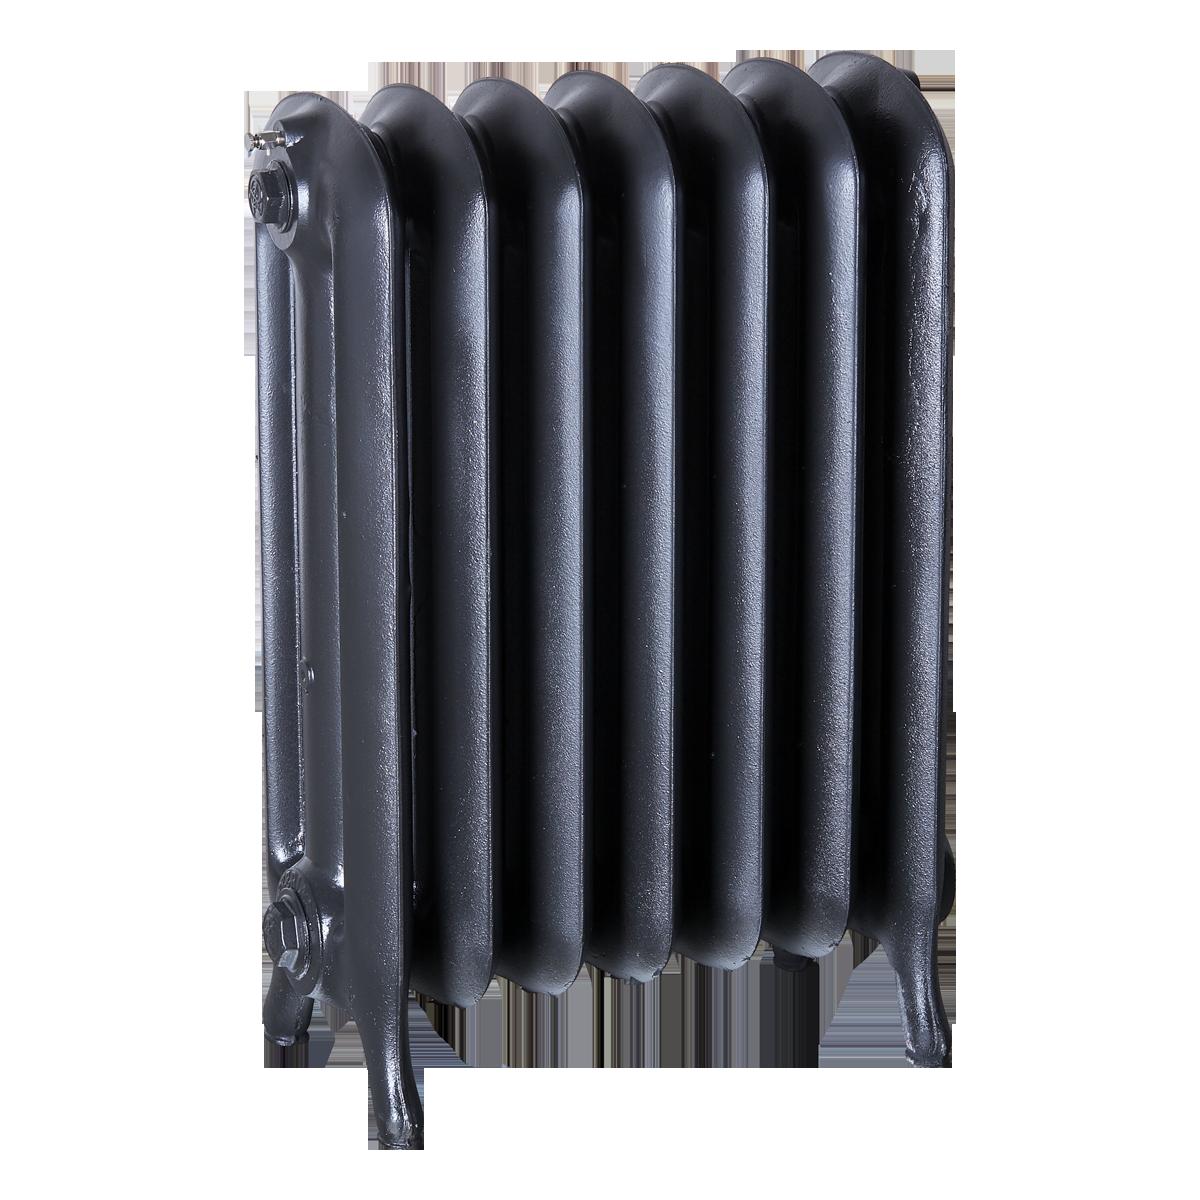 Ironworks Radiators Inc. refurbished cast iron radiator Eglinton in Black